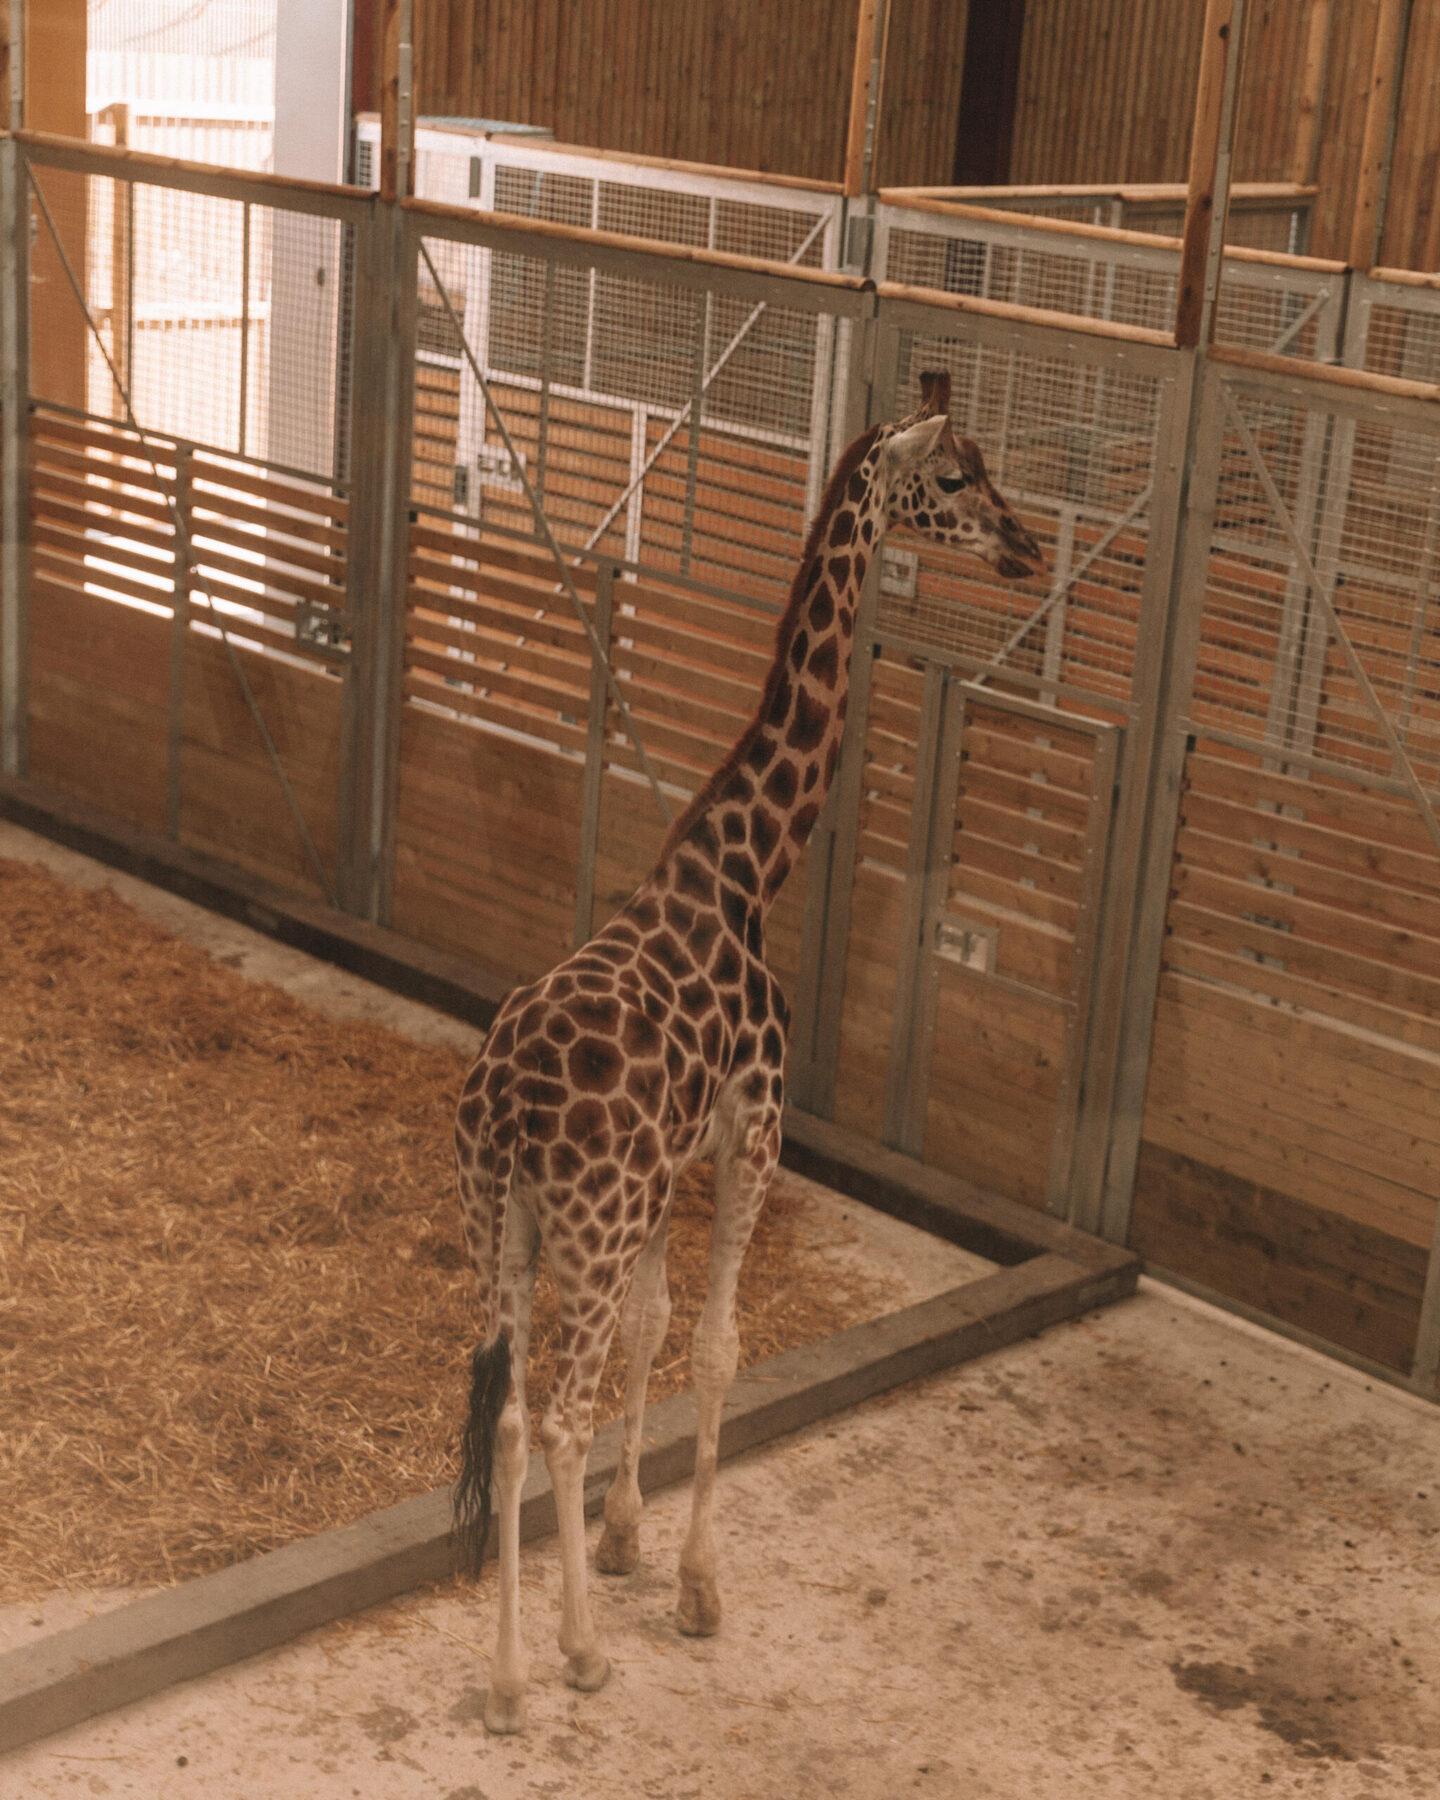 Wingham-Wildlife-Park-Giraffe-02